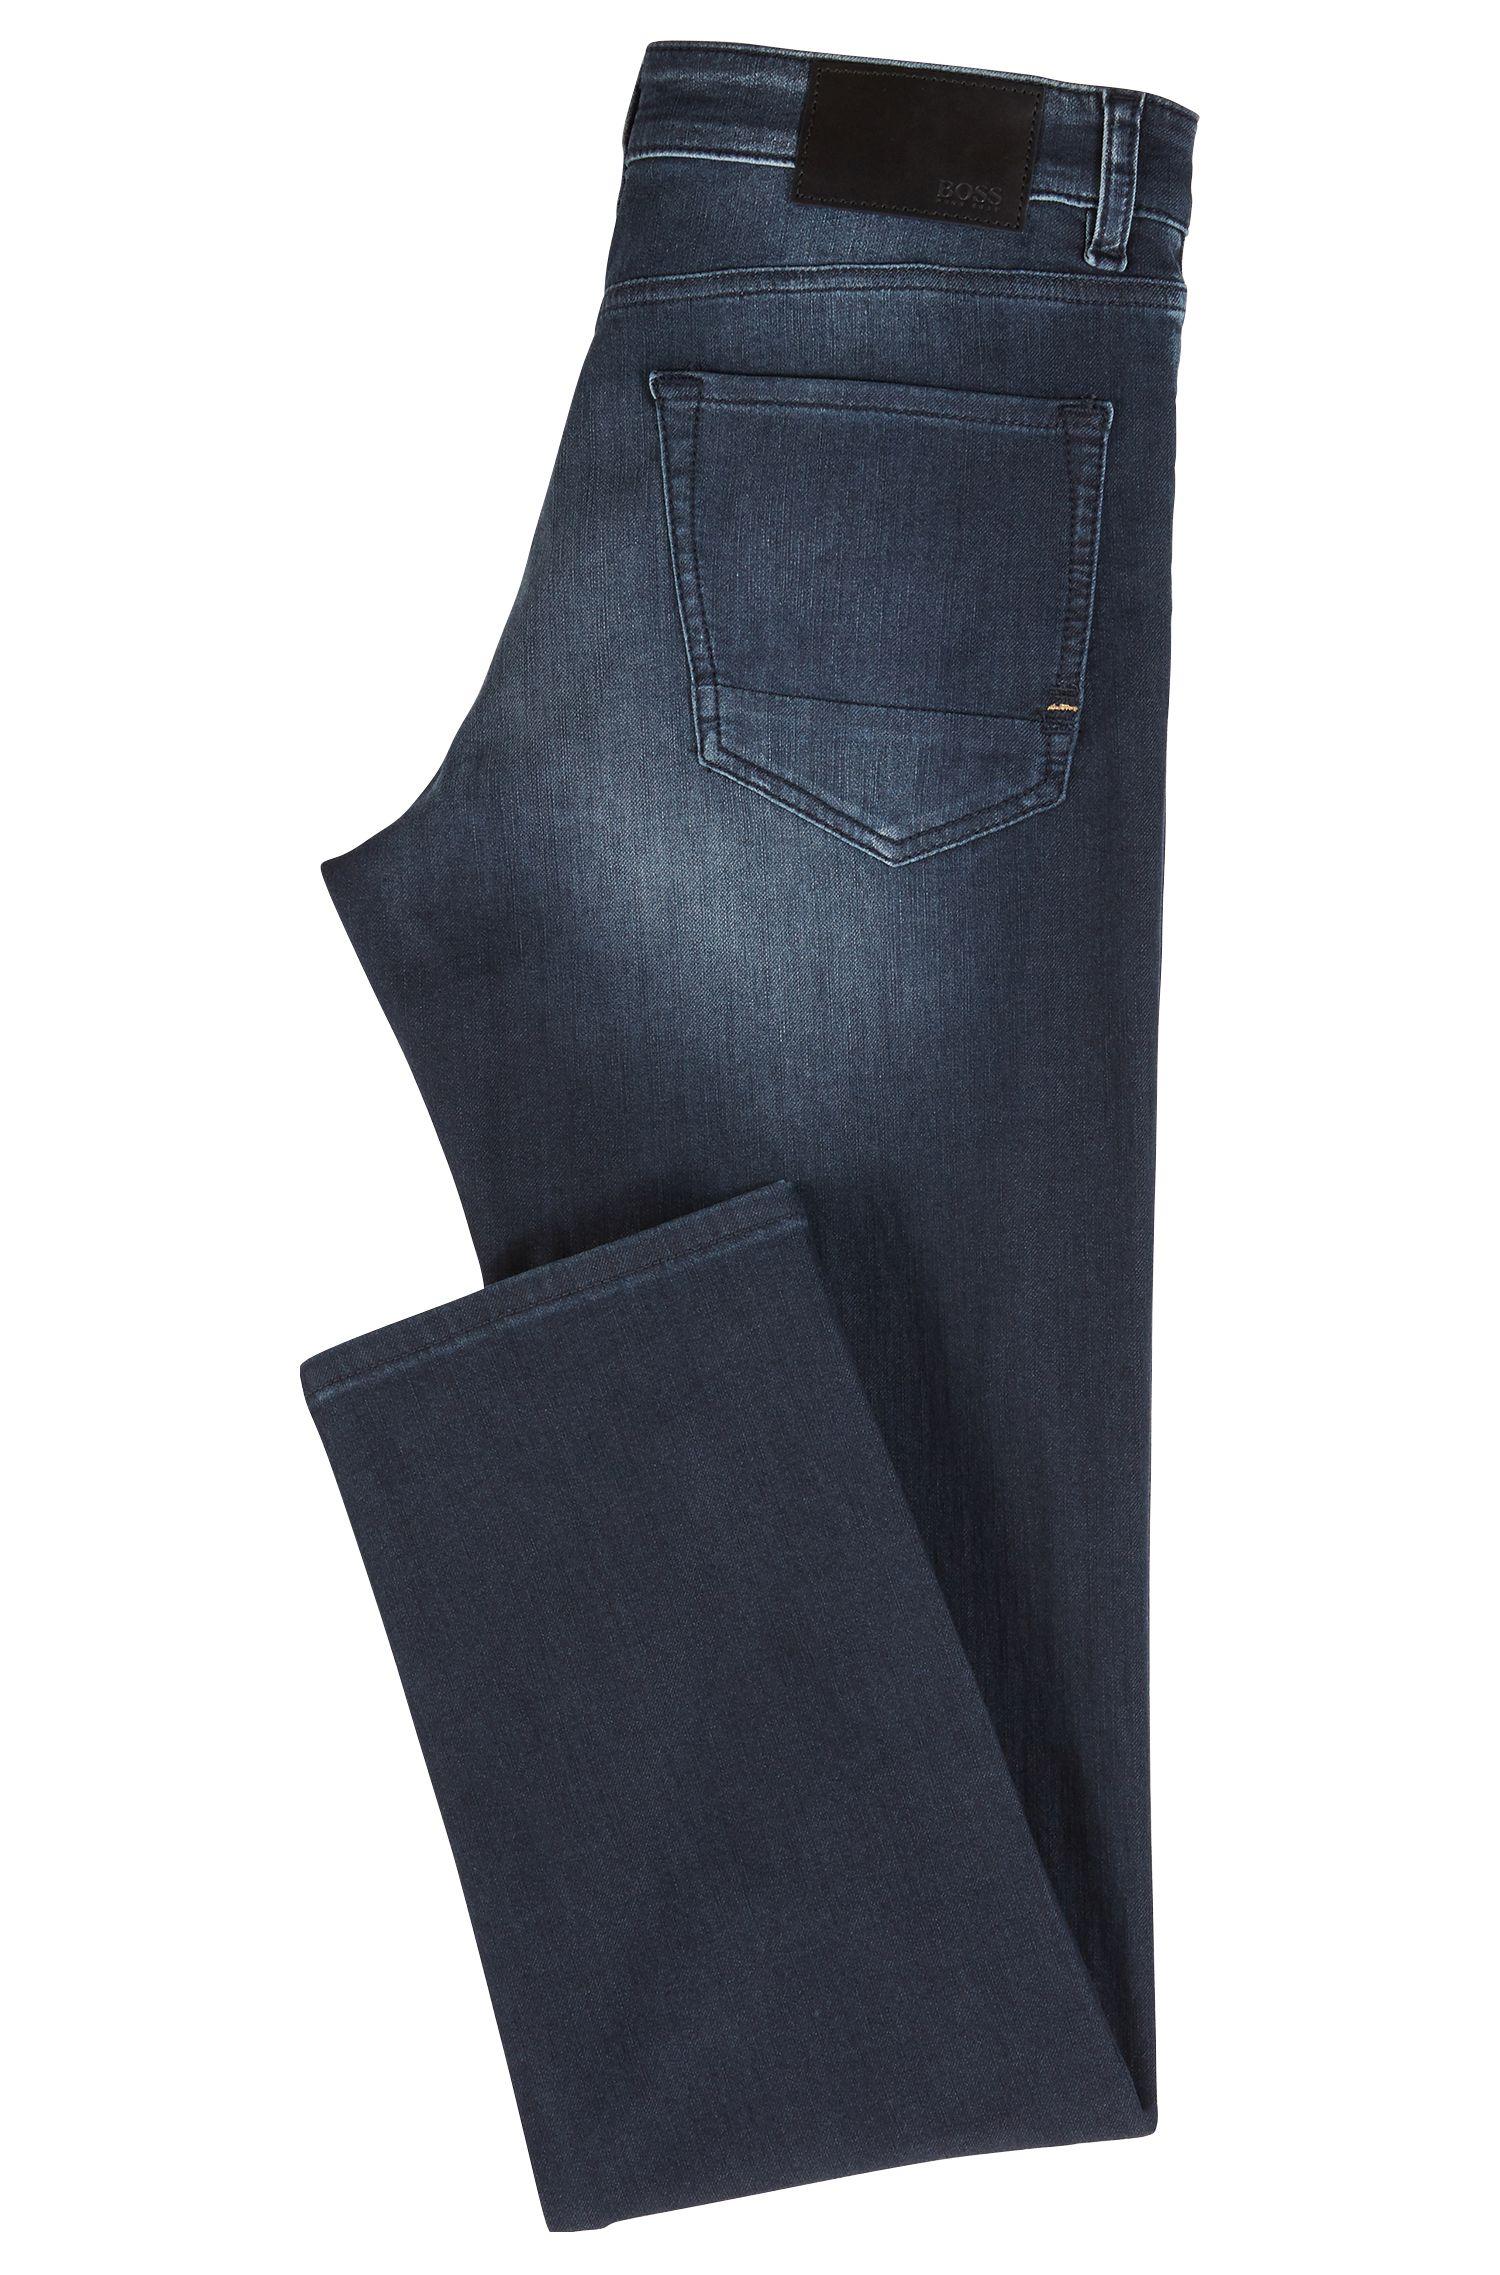 Überfärbte Regular-Fit Jeans aus gestricktem Denim, Dunkelblau